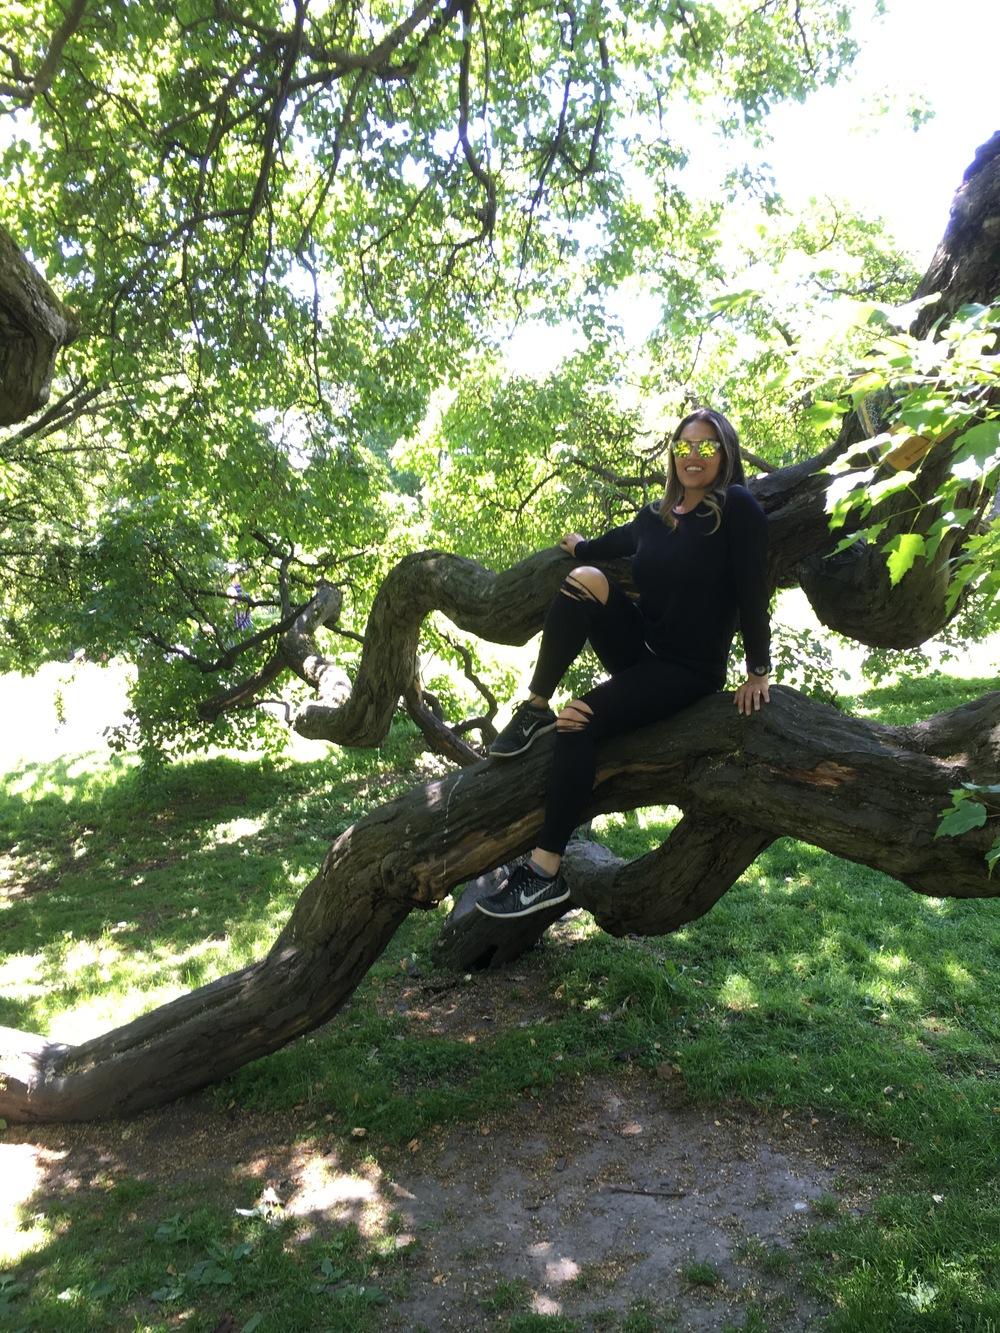 Taryn in the tree in the university botanical garden